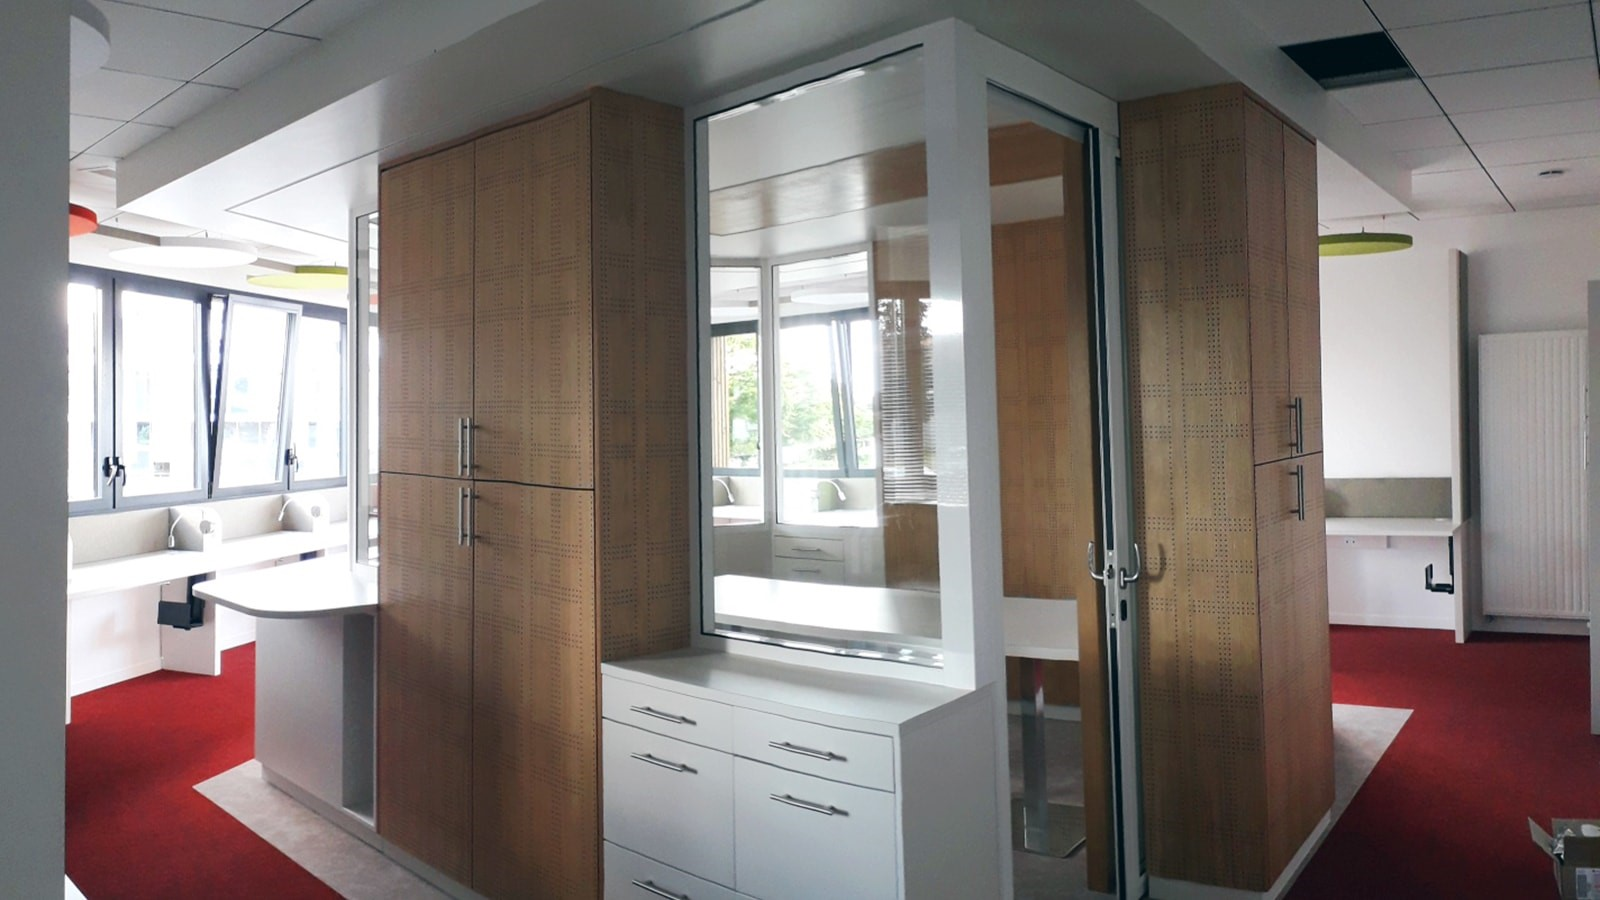 Bureaux Had Cholet Efi Design (10)